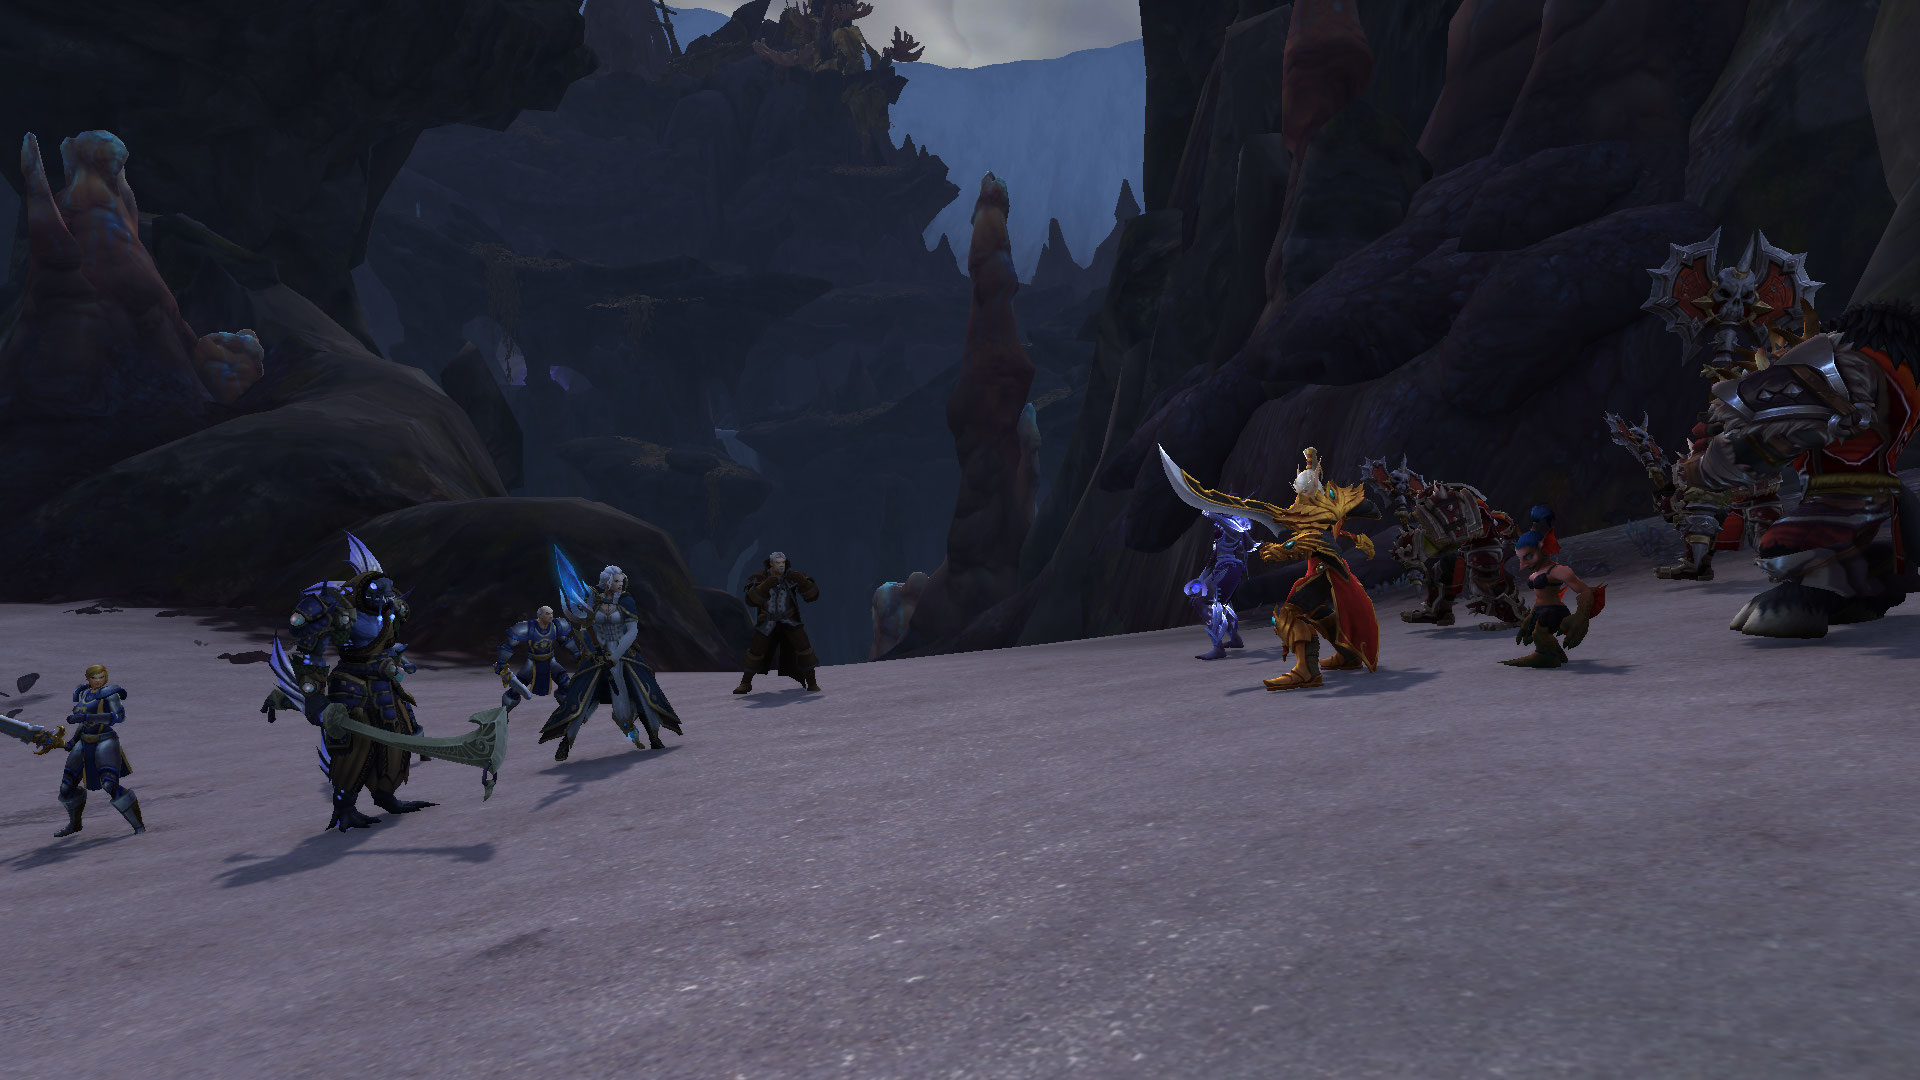 L'Alliance rencontre la Horde au moment d'attaquer les forces d'Azshara